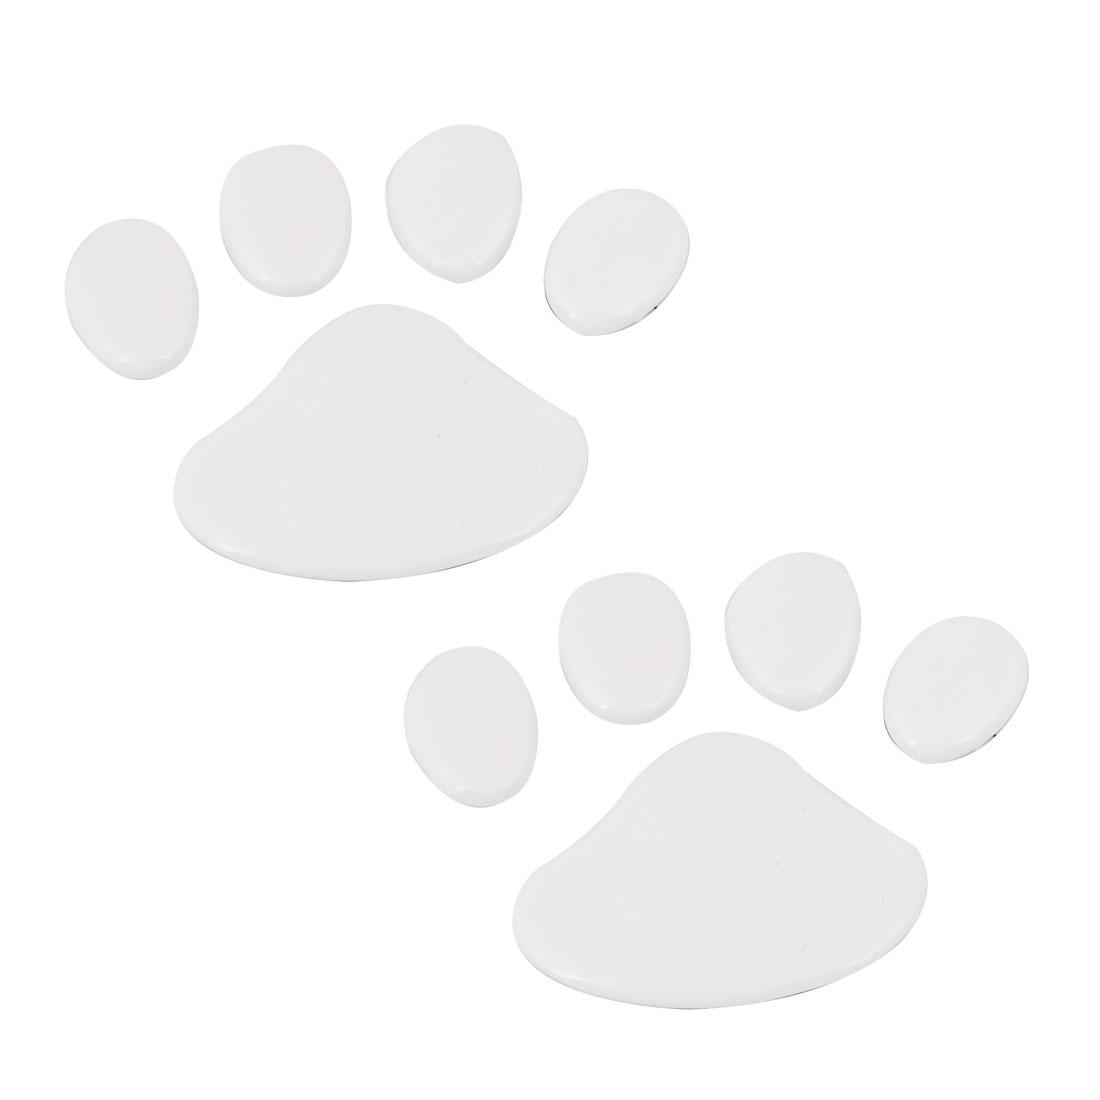 2 Pcs White Dog Footprint Badge Emblems Sticker for Vehicle Car